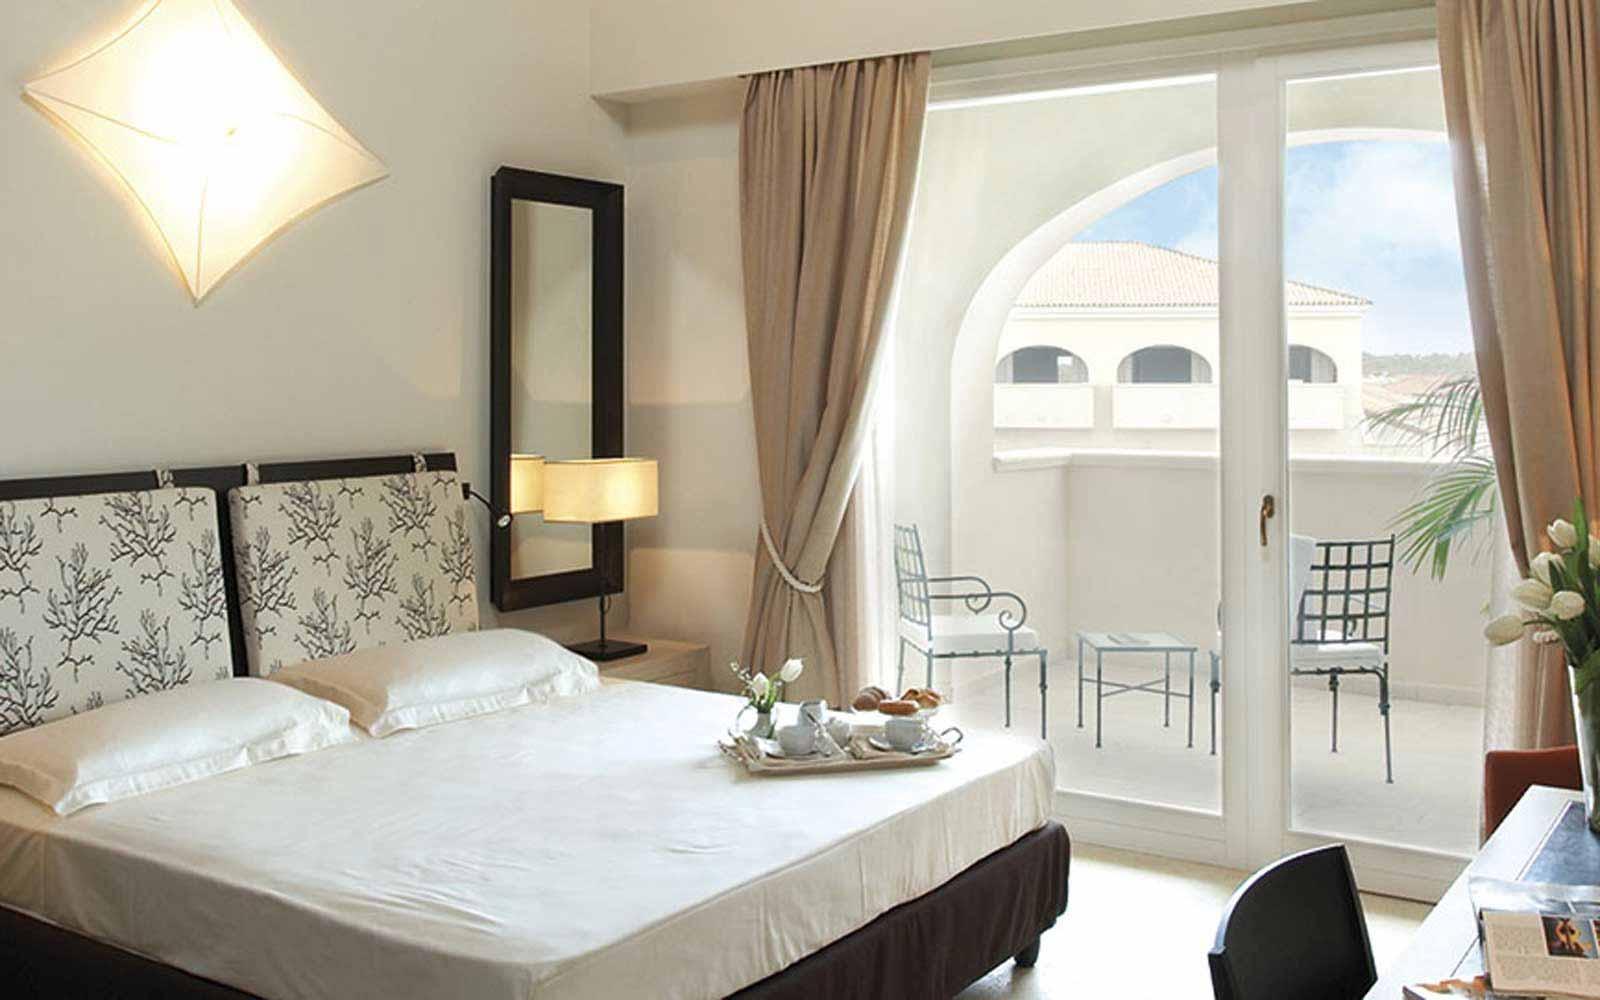 Standard room at Hotel Marinagri